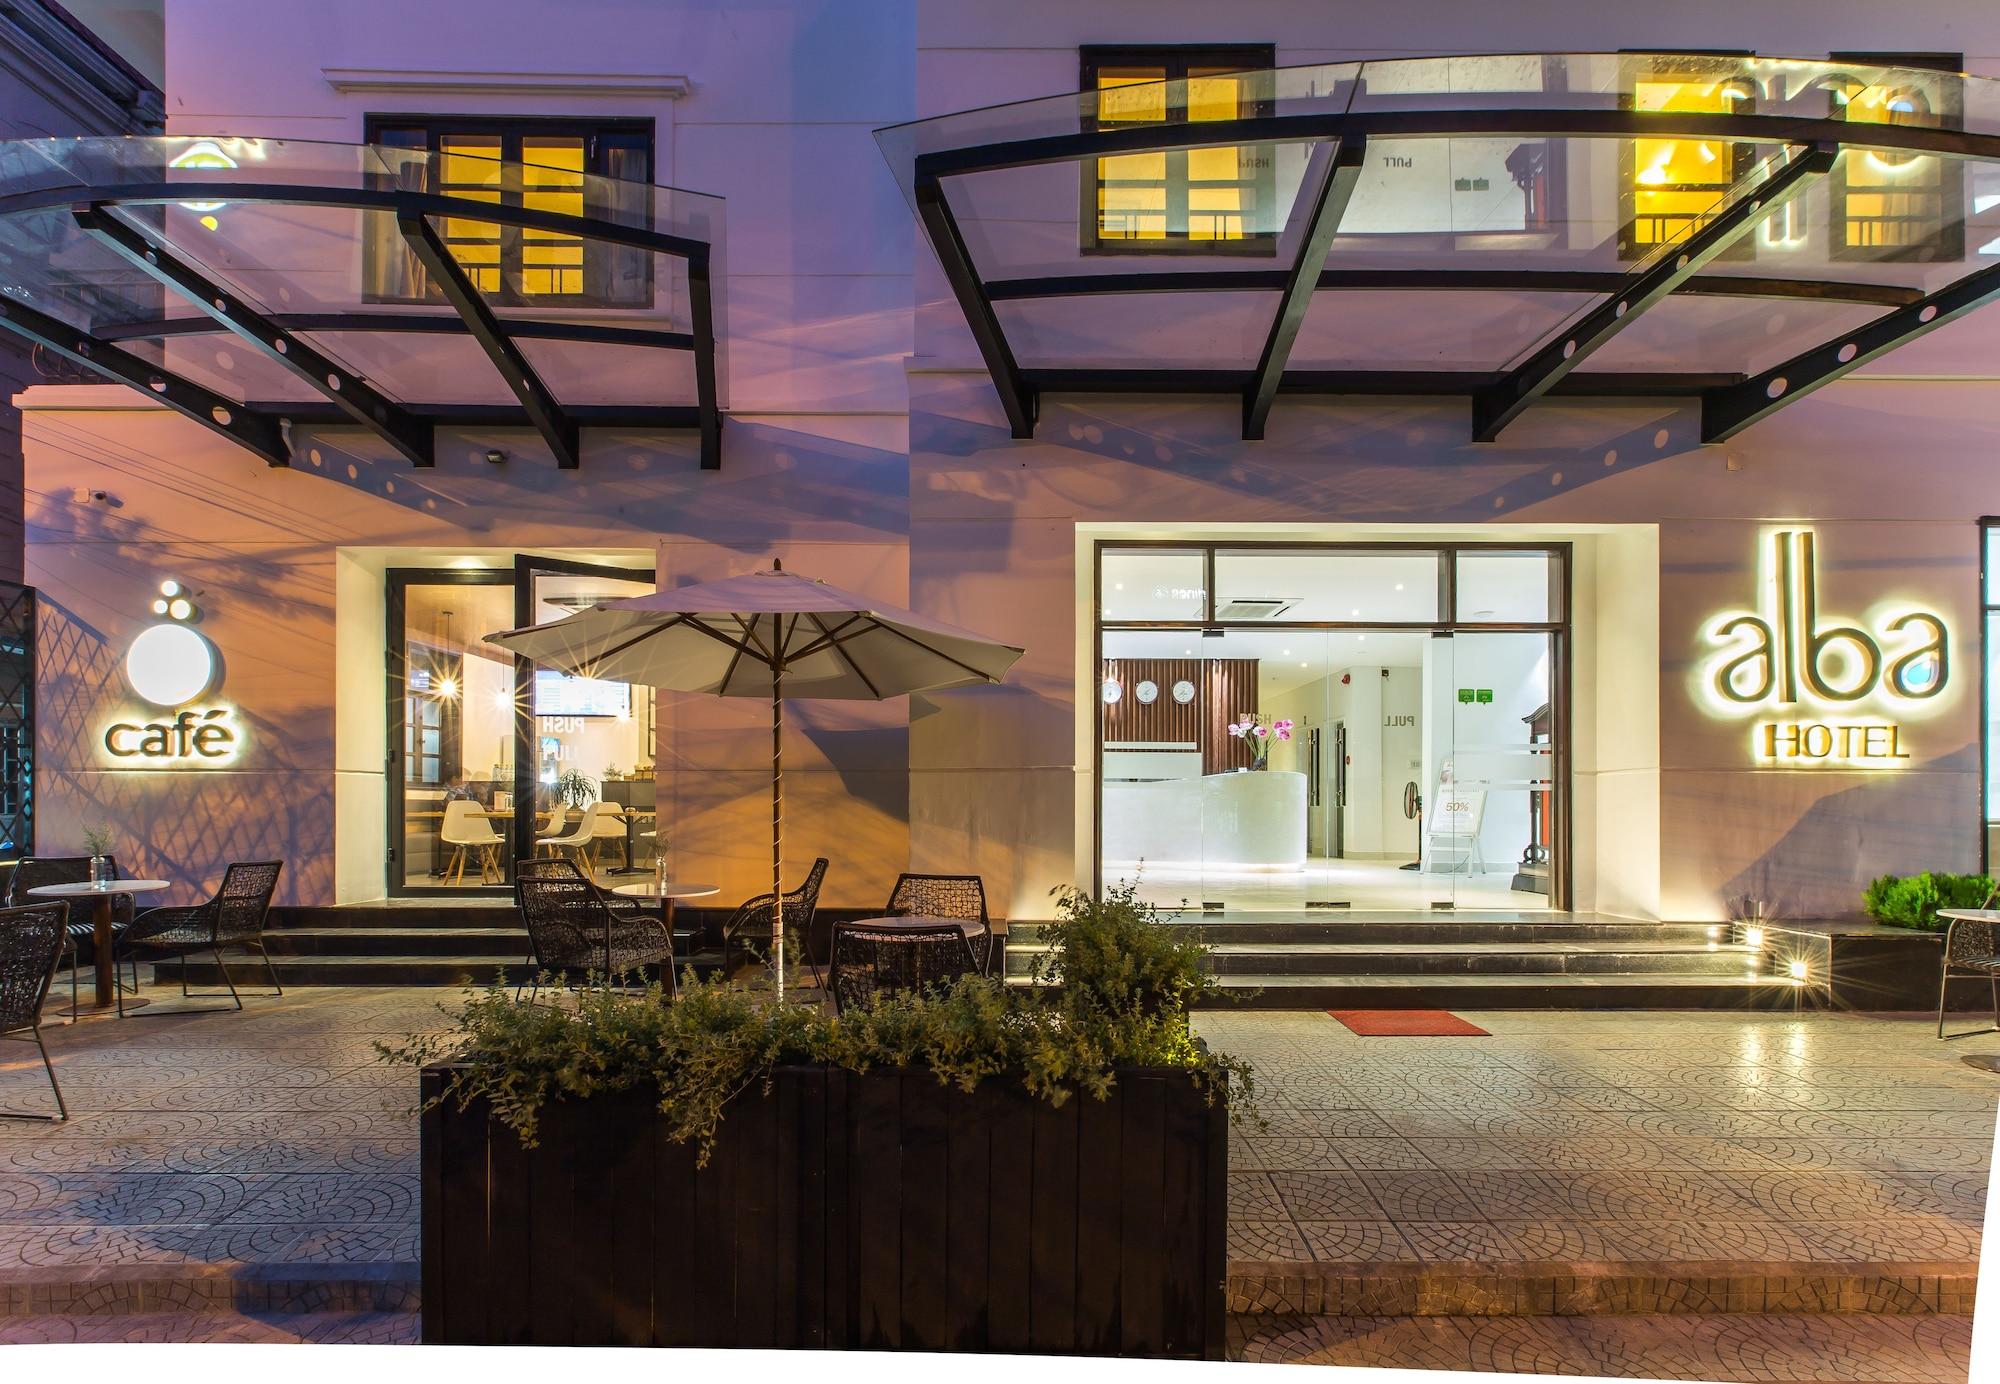 Alba Hotel, Huế